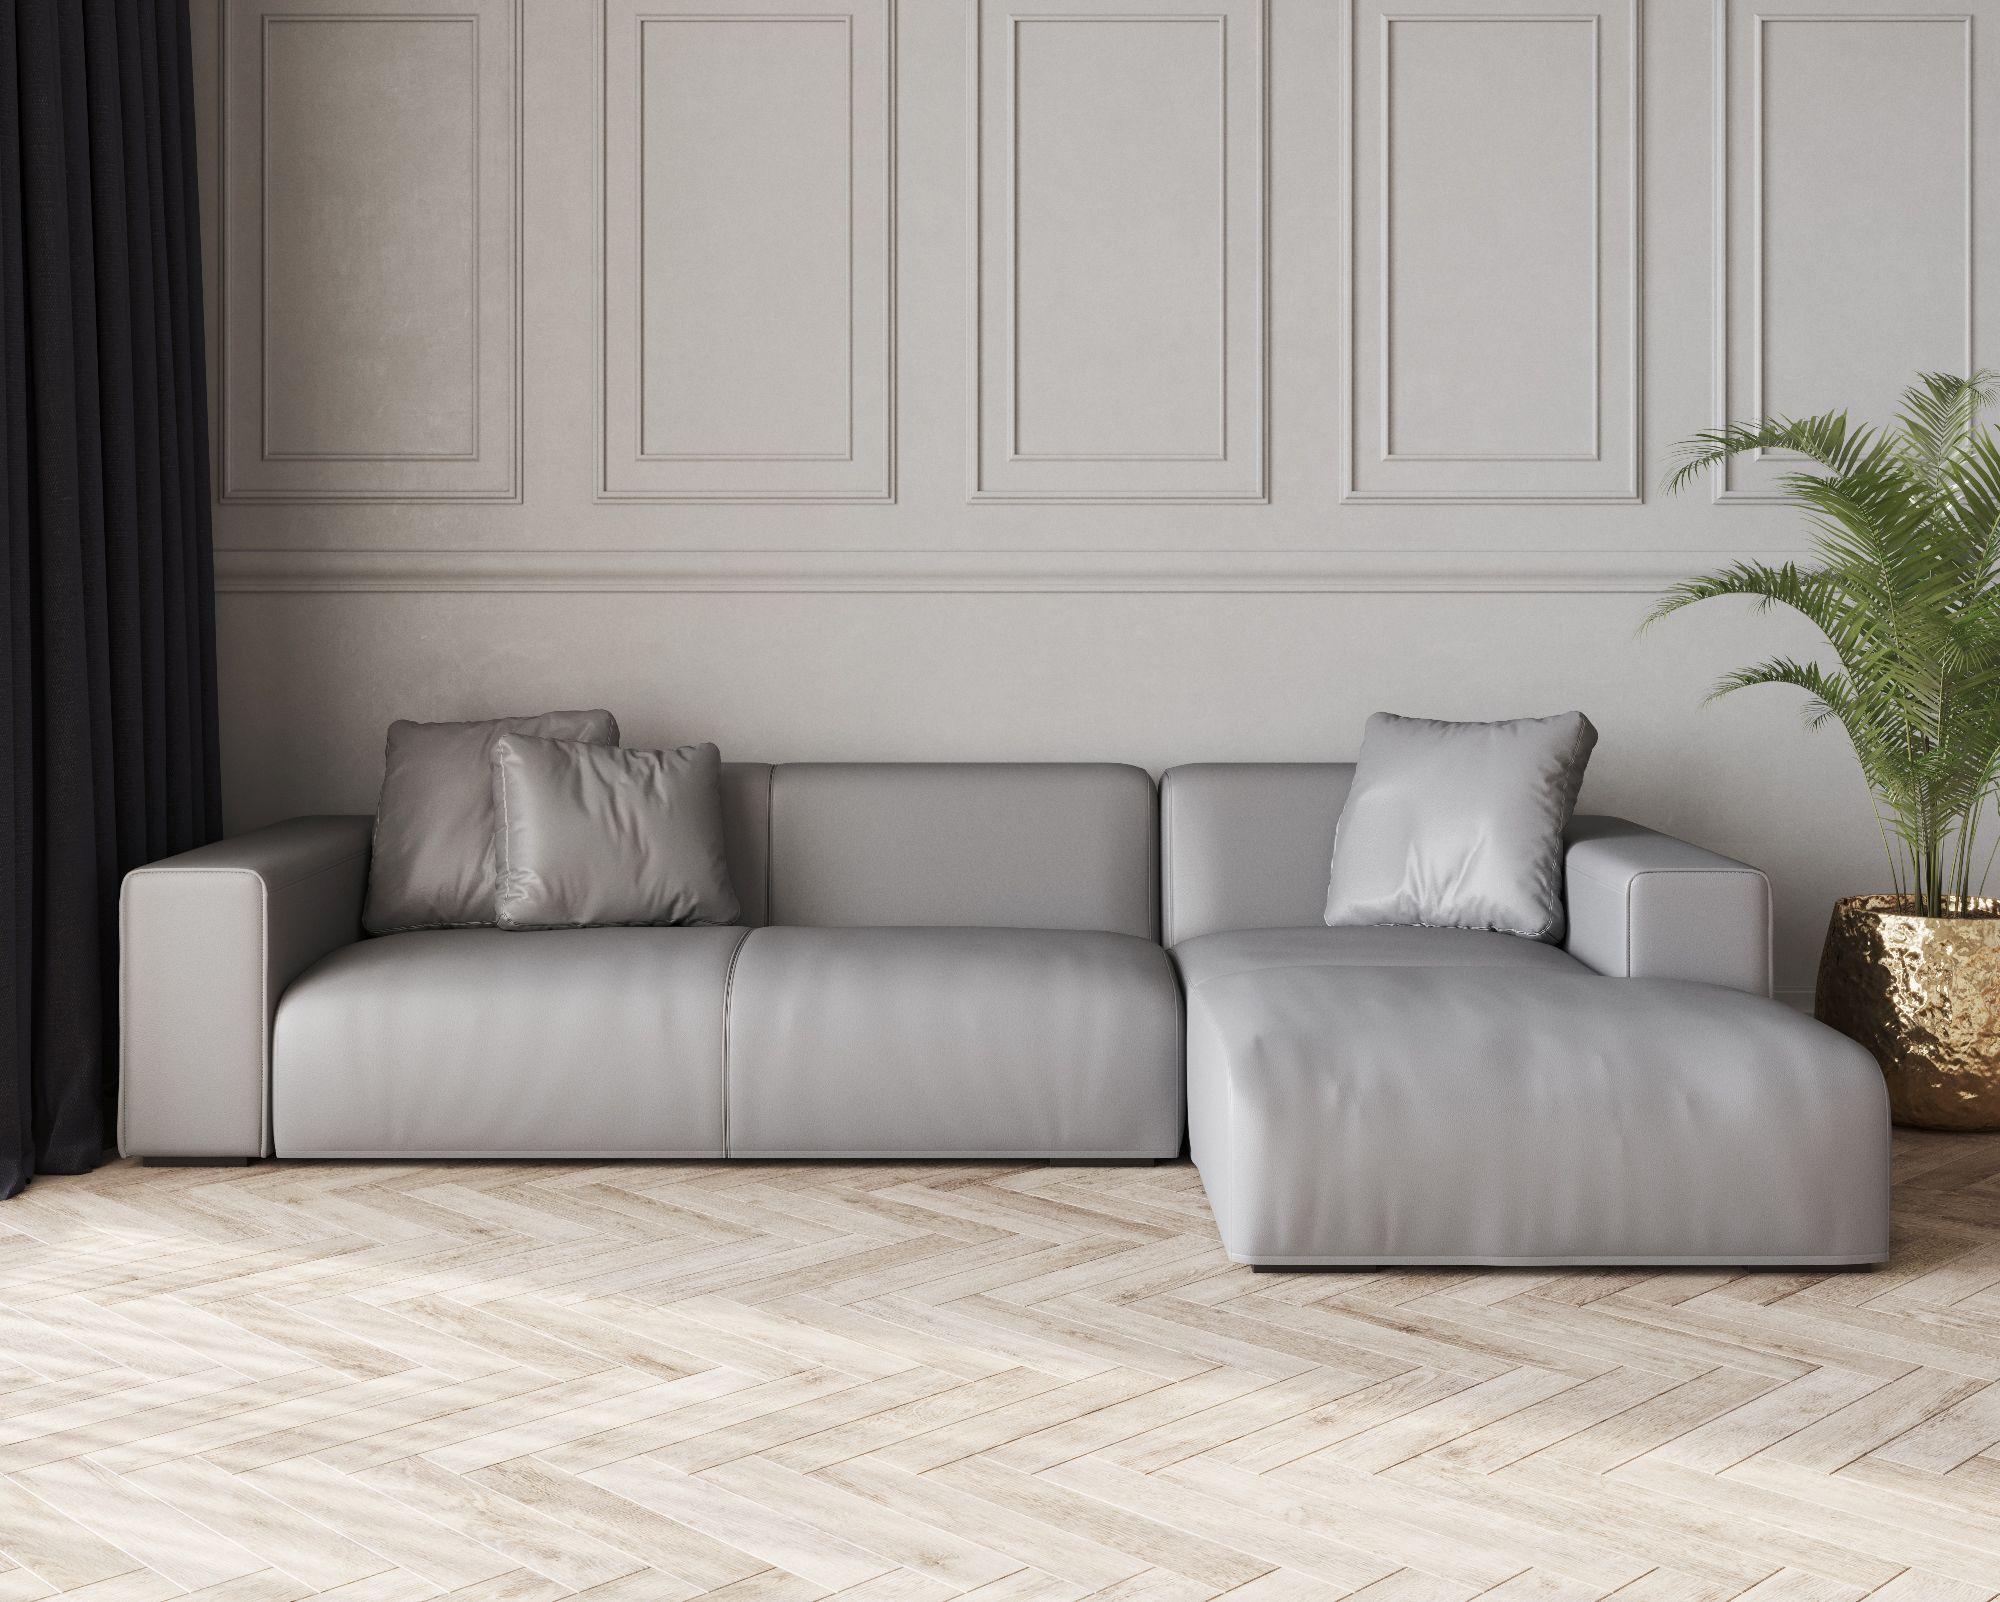 Buy Nemo Low Leather Corner Sofa Online In London Uk